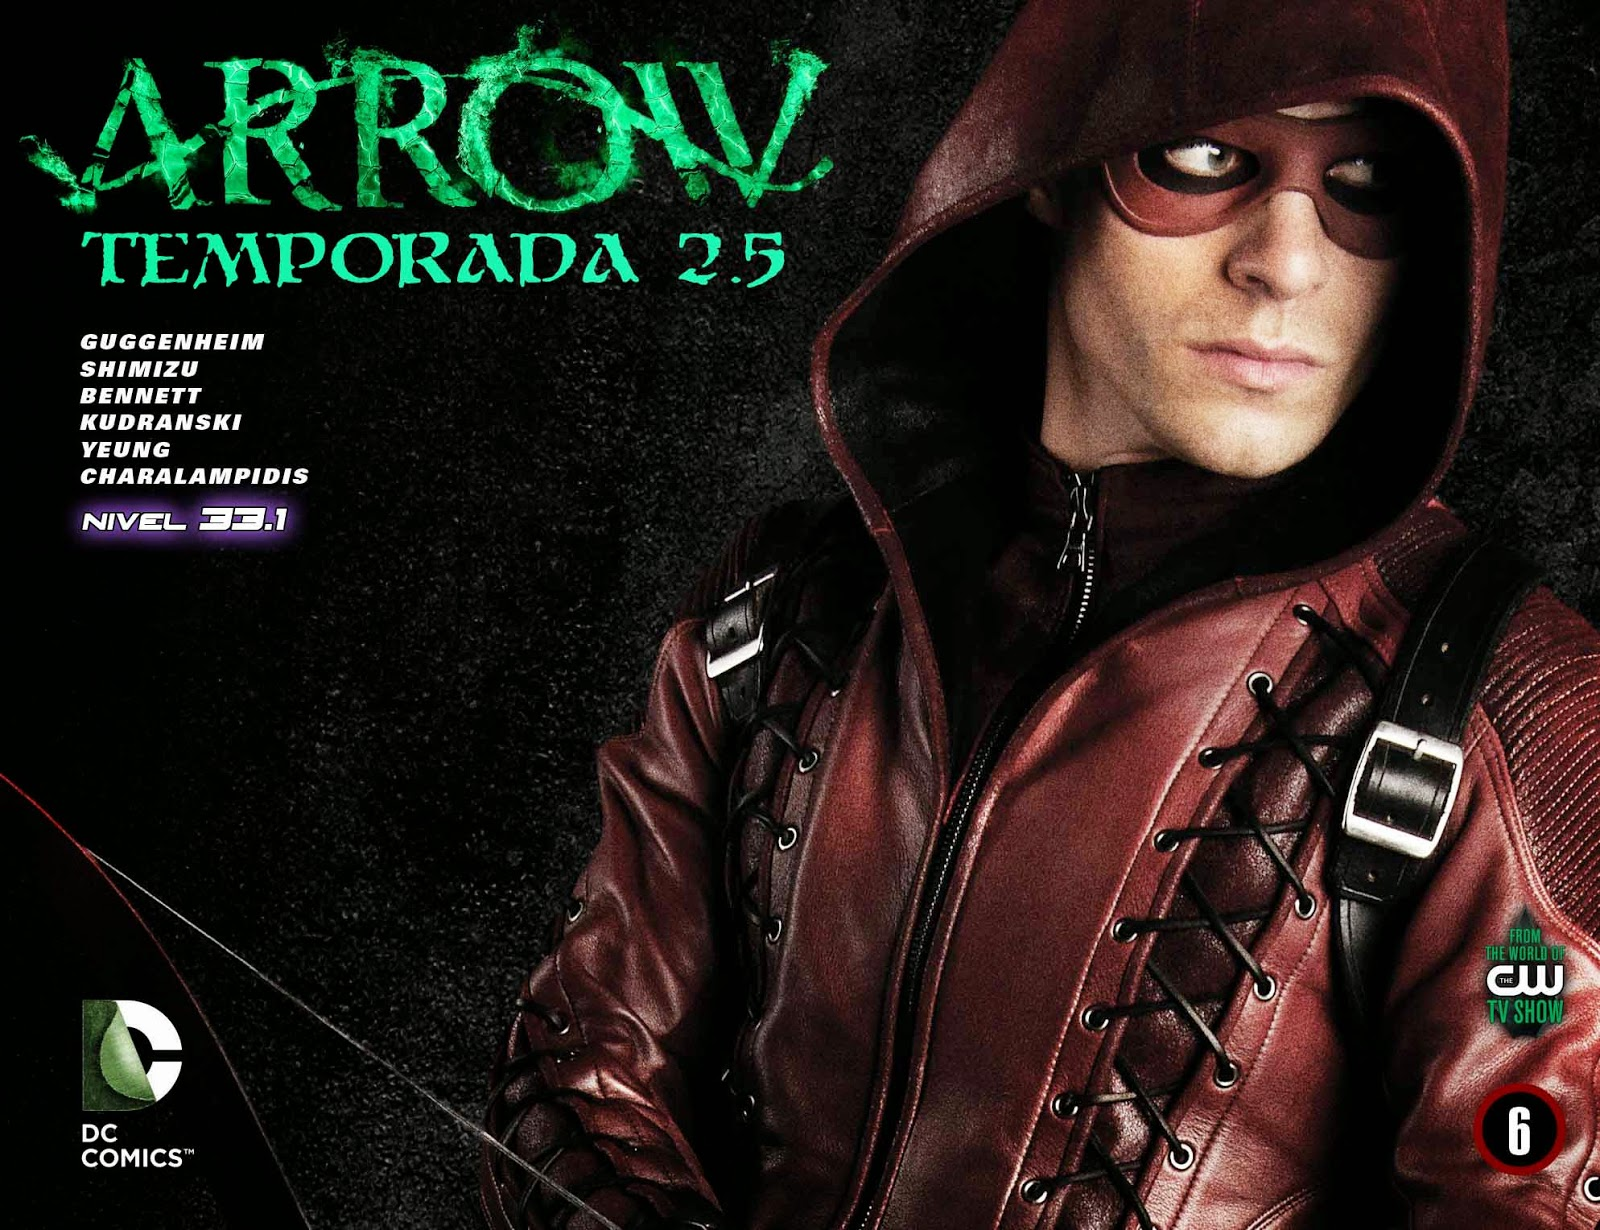 http://www.mediafire.com/download/urvd6p2c9dob64r/arrow+6.cbr